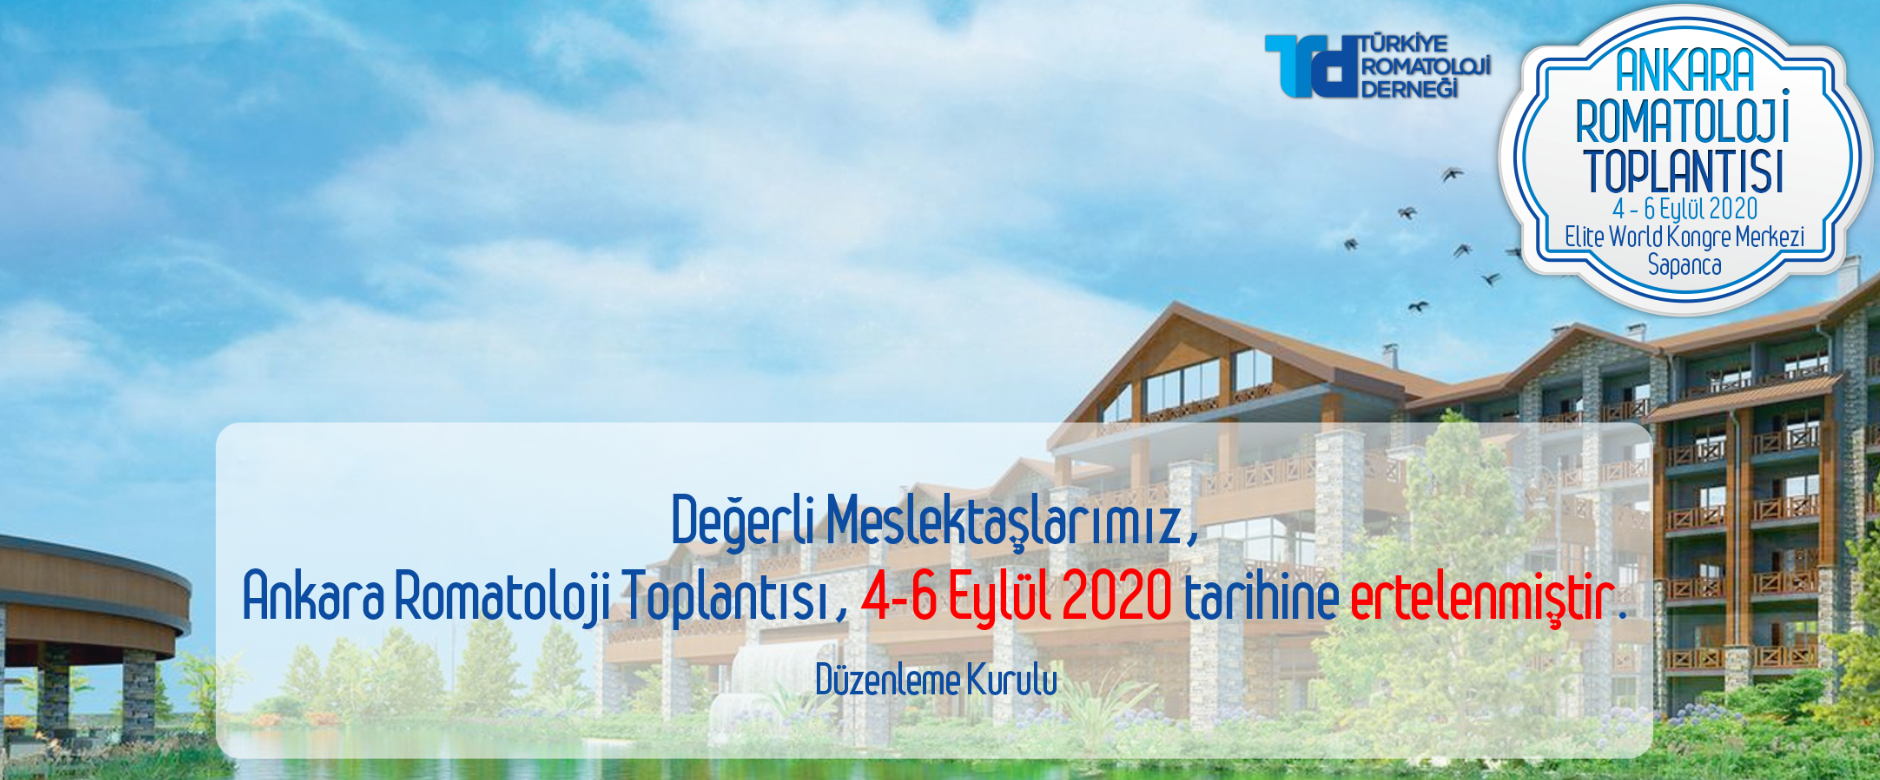 (VIRTUAL) Ankara Romatoloji Toplantısı 2020